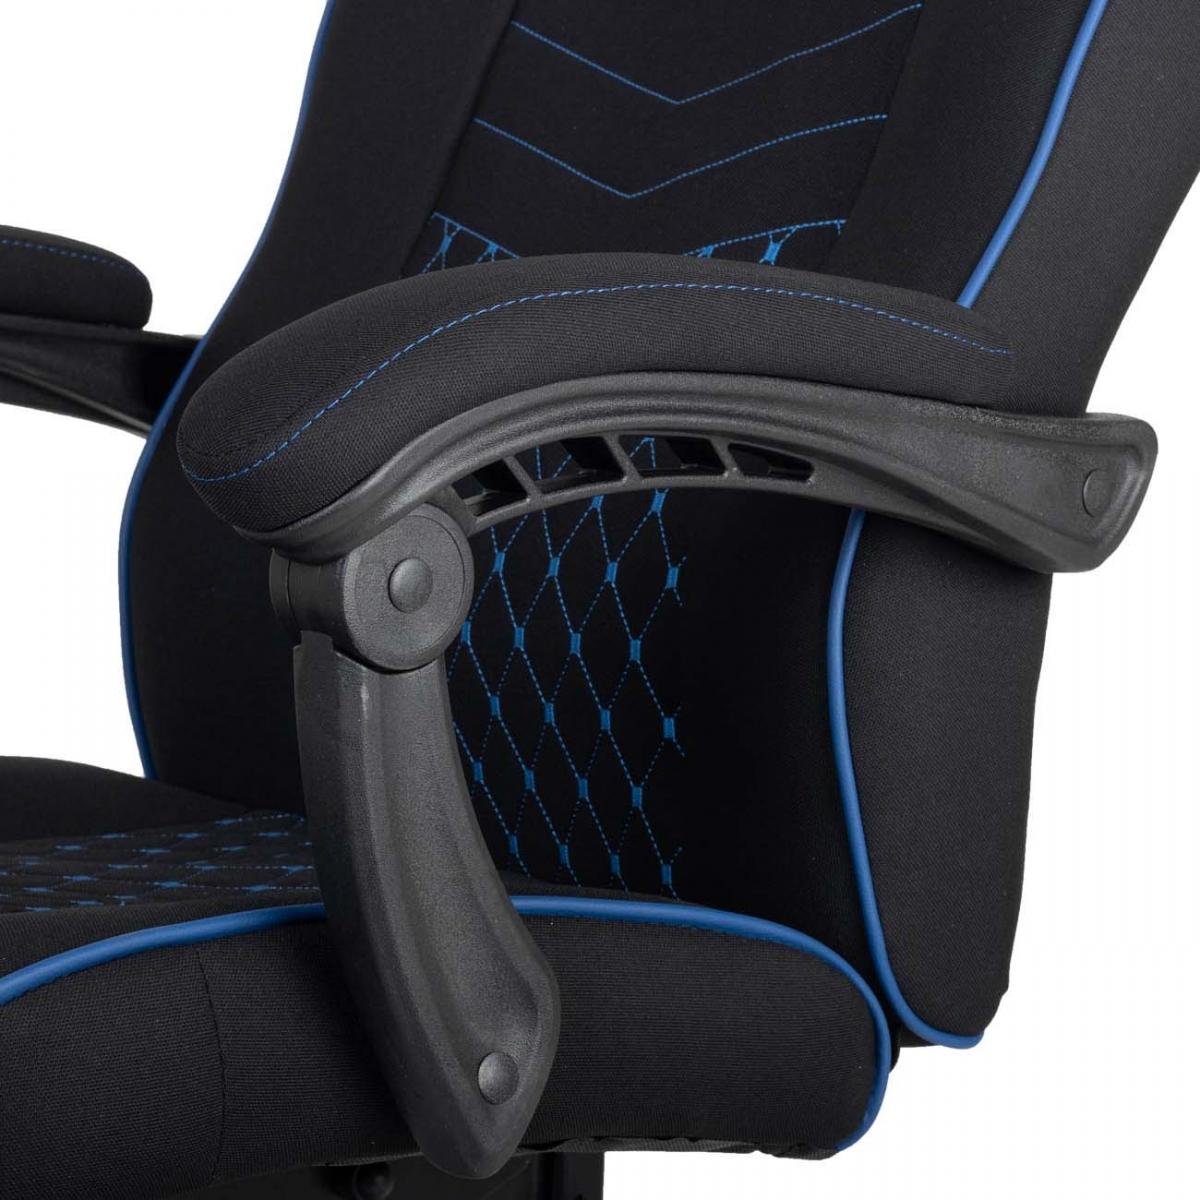 Cadeira Gamer DT3sports GTZ, Blue